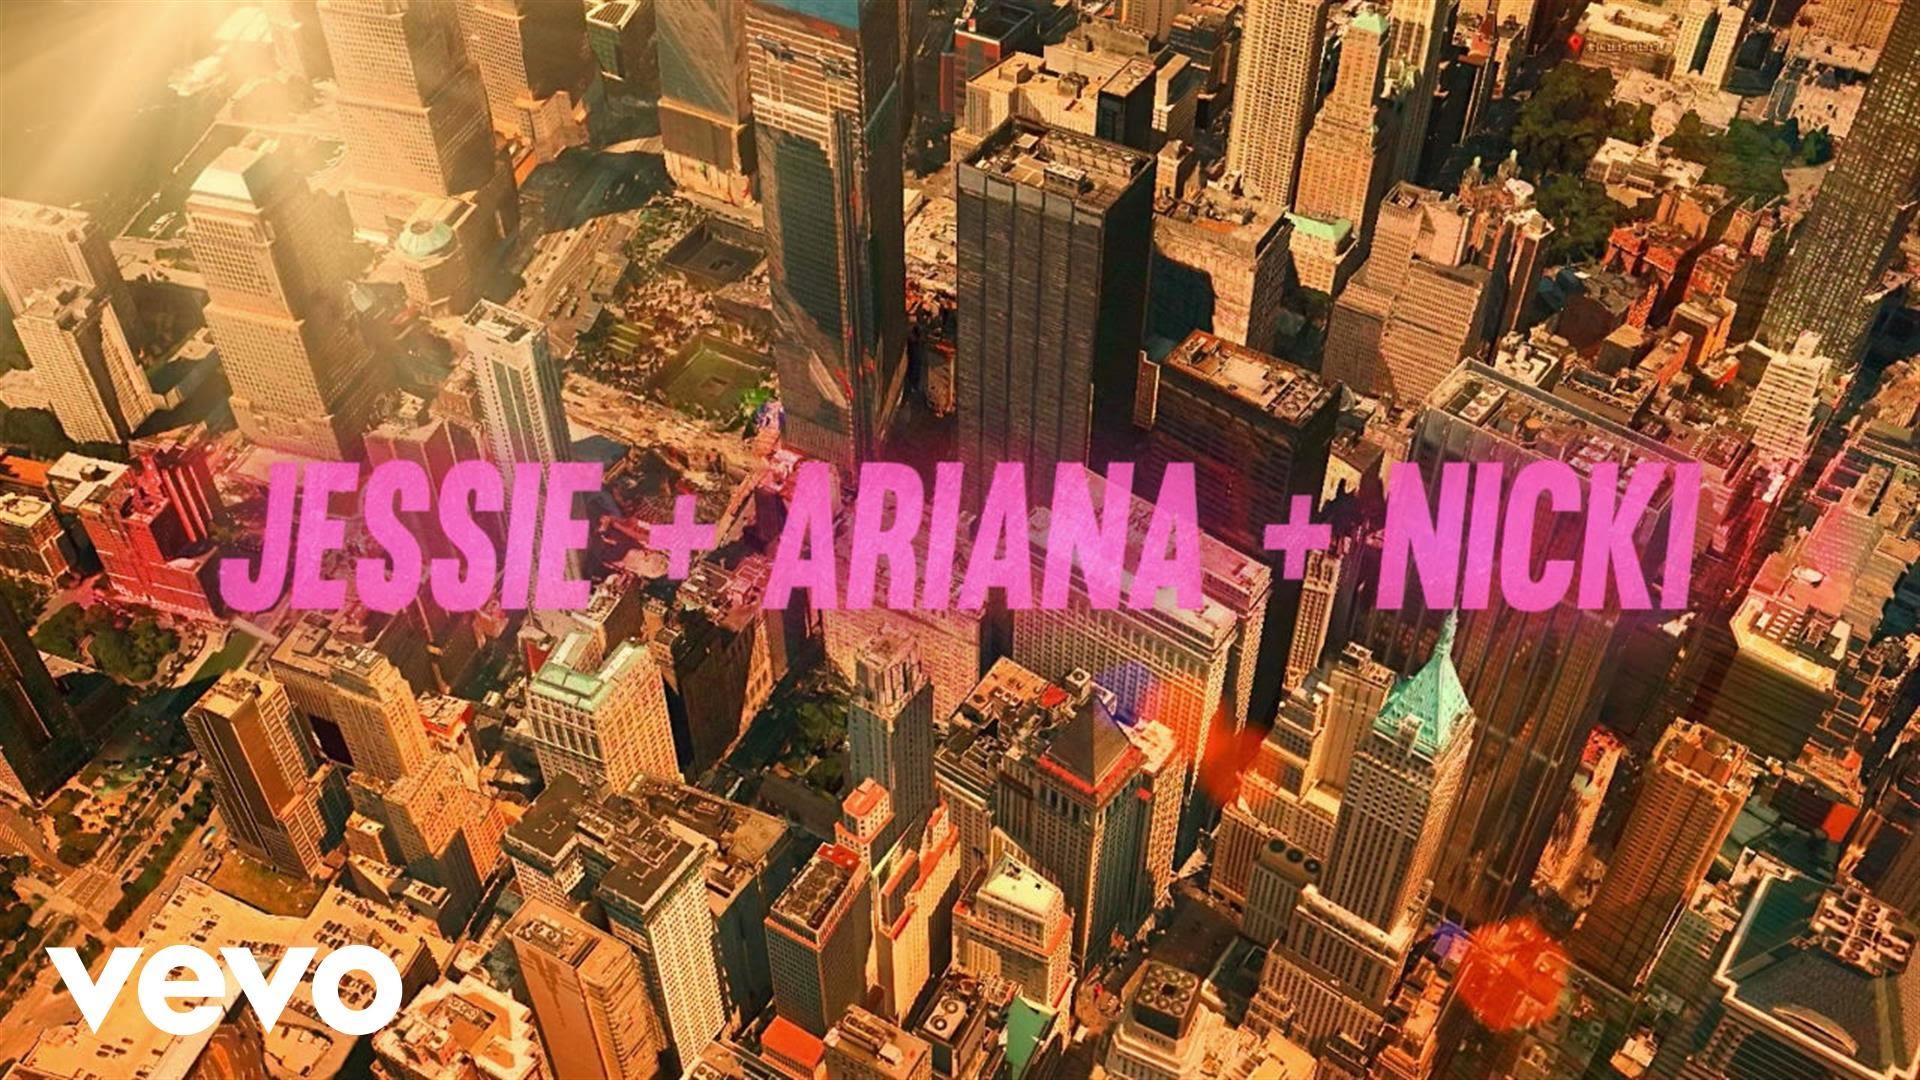 Jessie J, Ariana Grande, Nicki Minaj — Bang Bang ft. Ariana Grande, Nicki Minaj